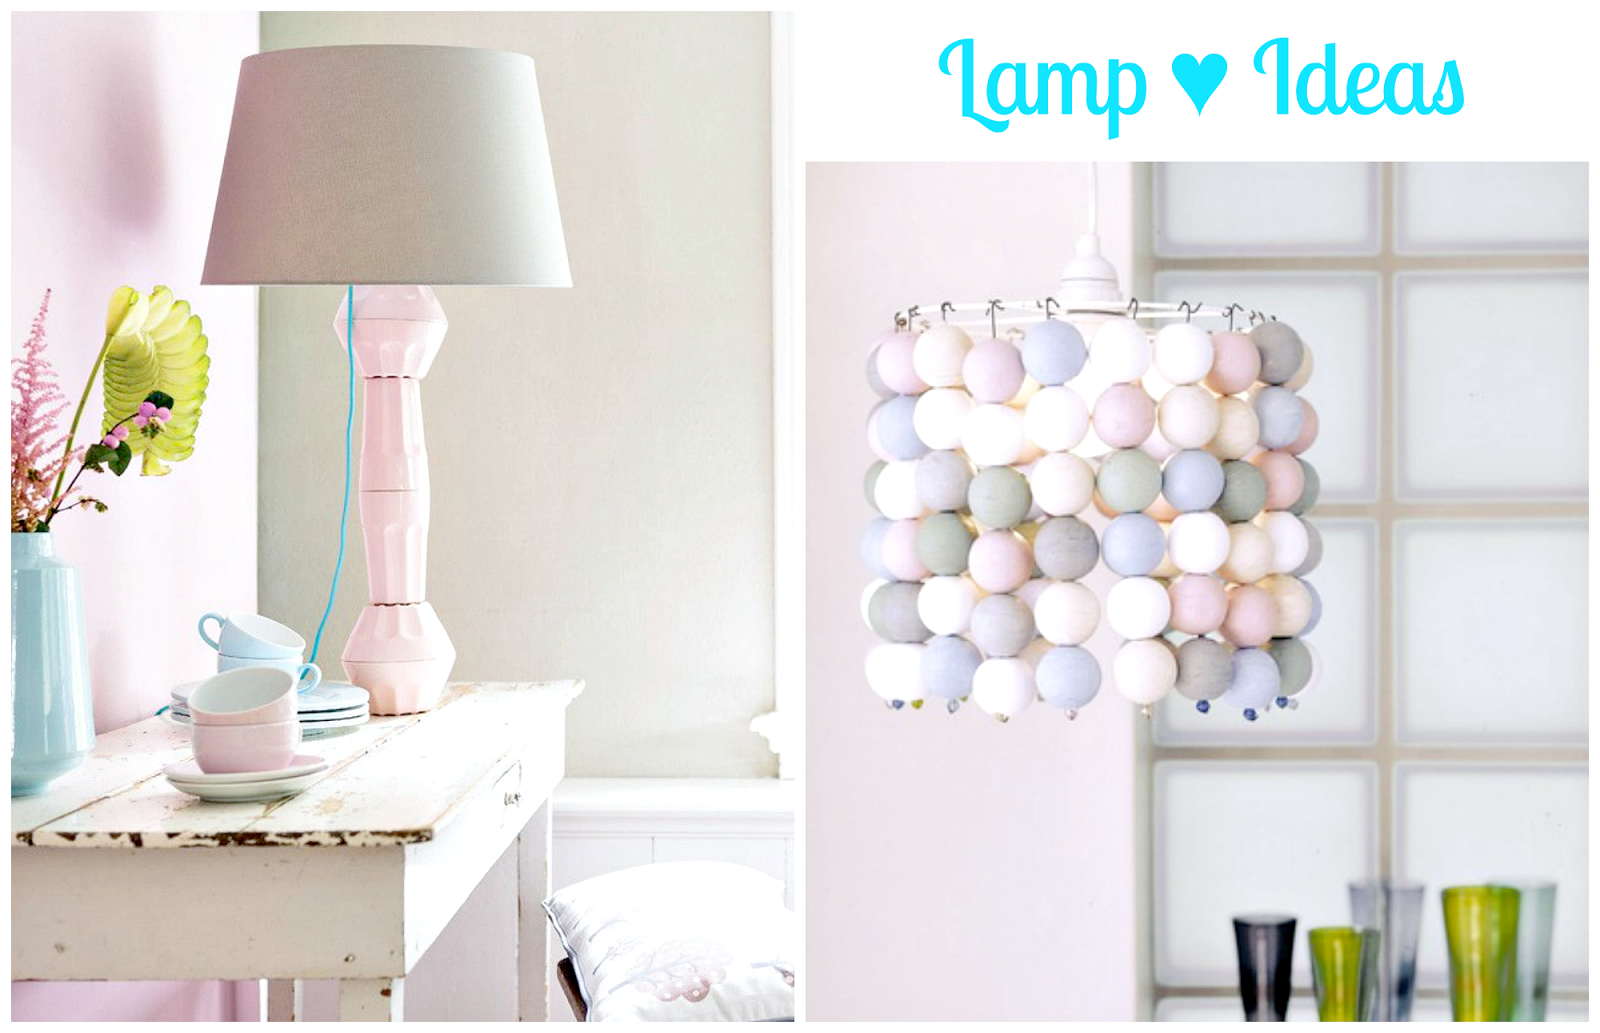 ideas lamp